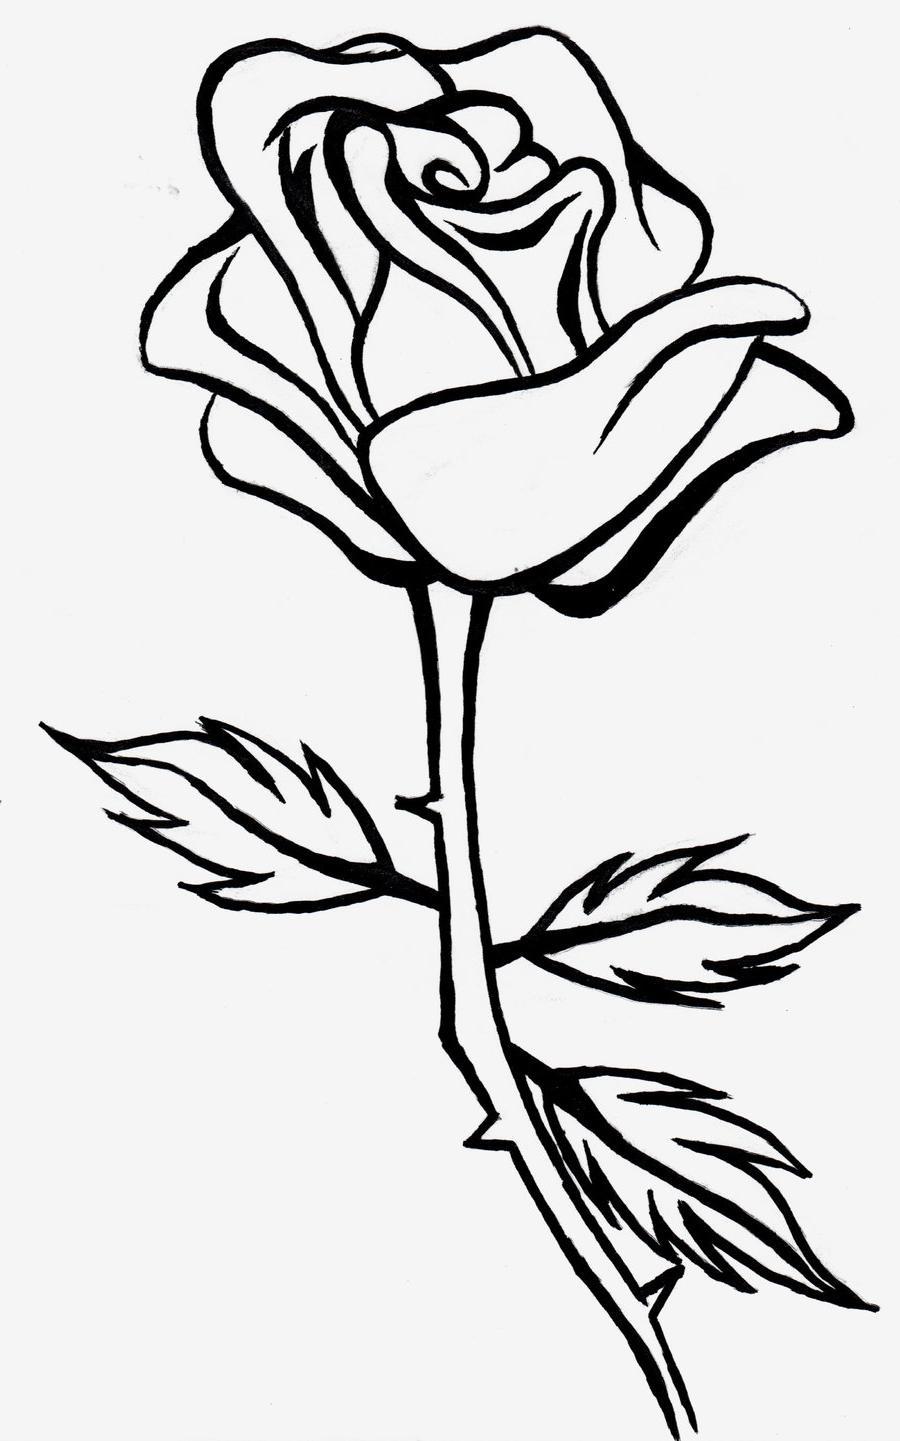 900x1441 Top Roses Free Rose Clipart Public Domain Flower Clip Art Images